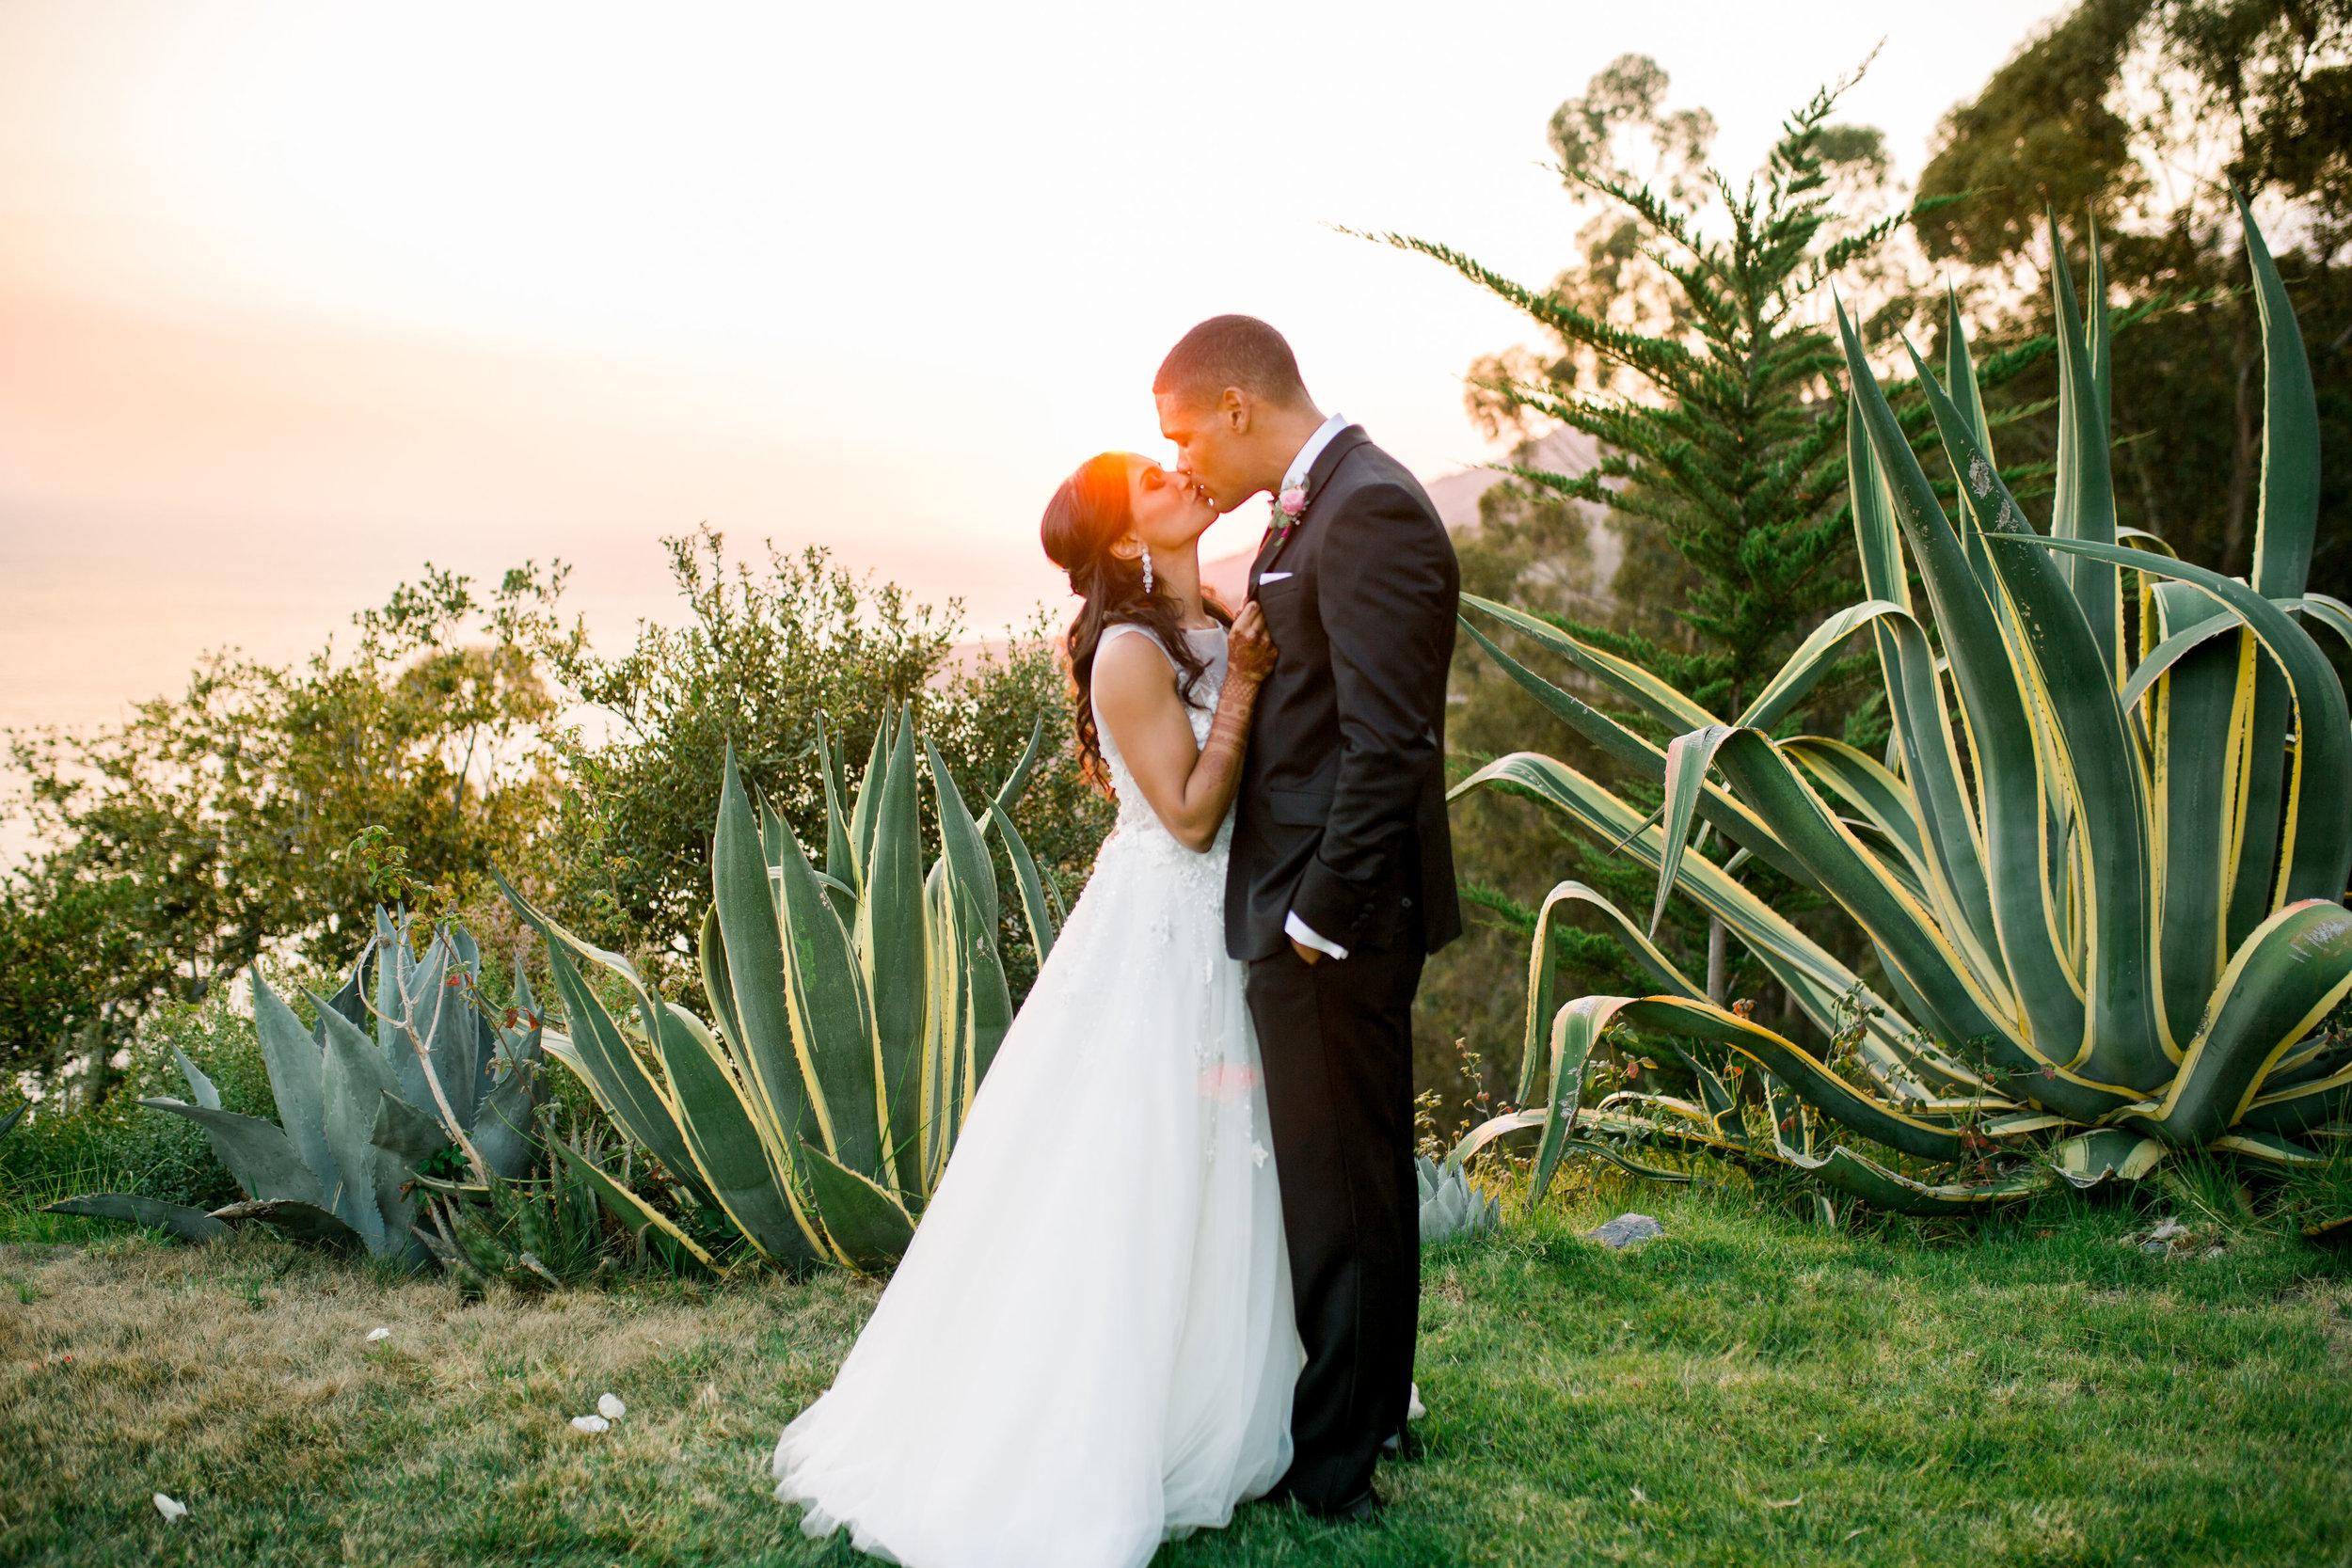 DESTINATION WEDDINGS -